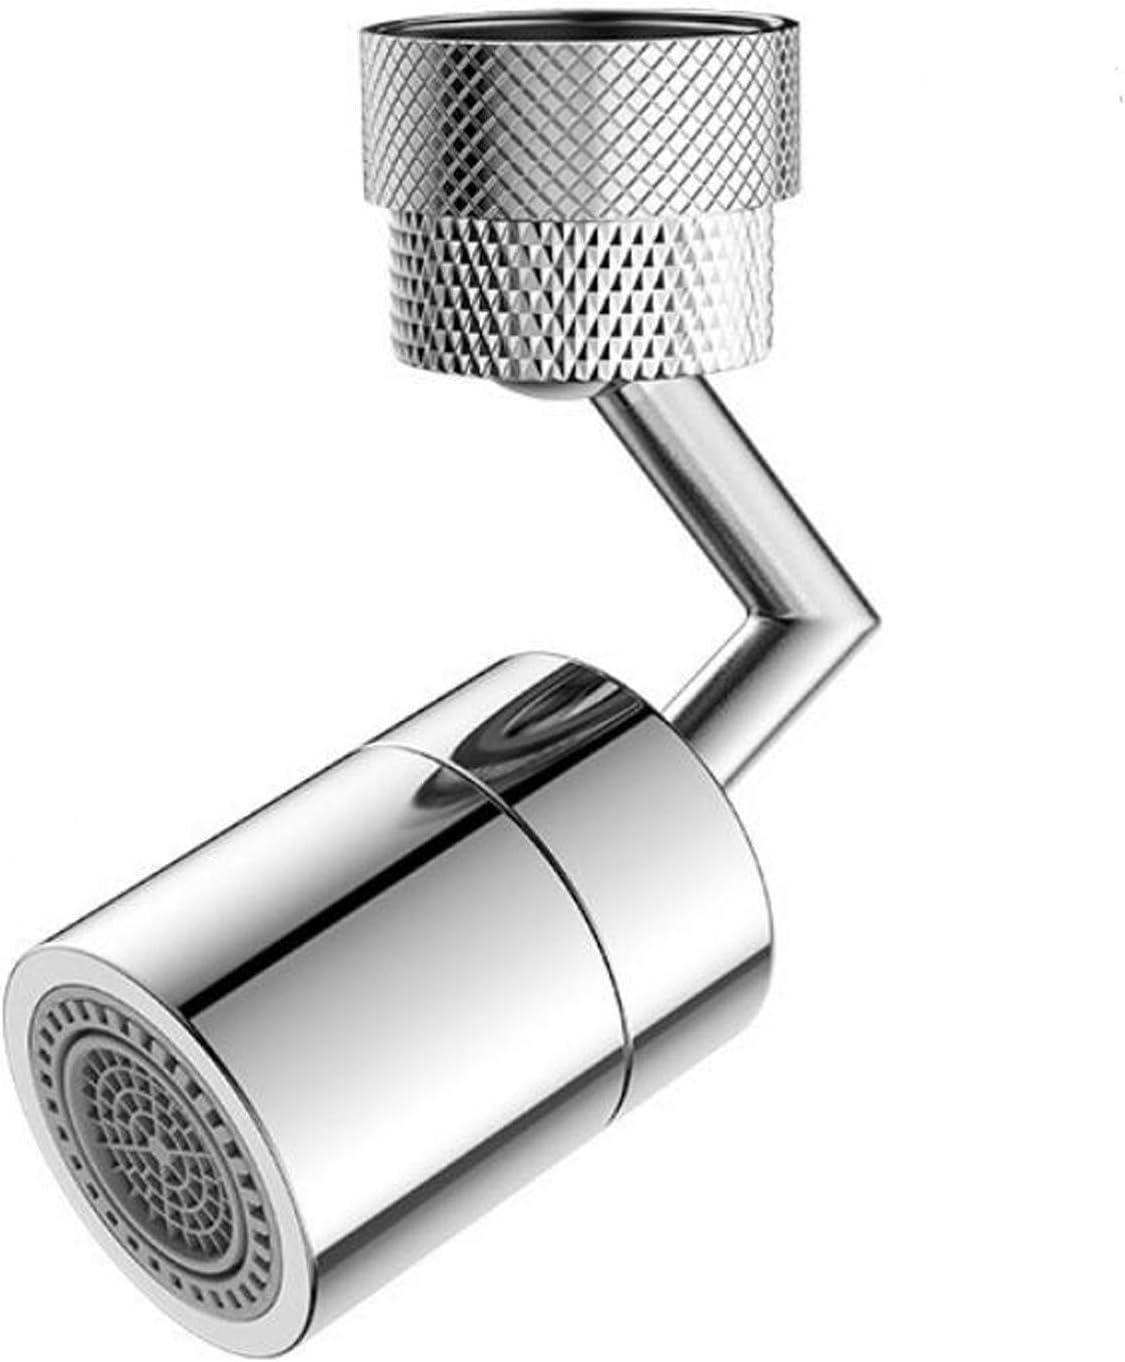 720 Degree 5 ☆ popular Swivel Sink Faucet Aerator Big Large Selling rankings Aera Flow Angle